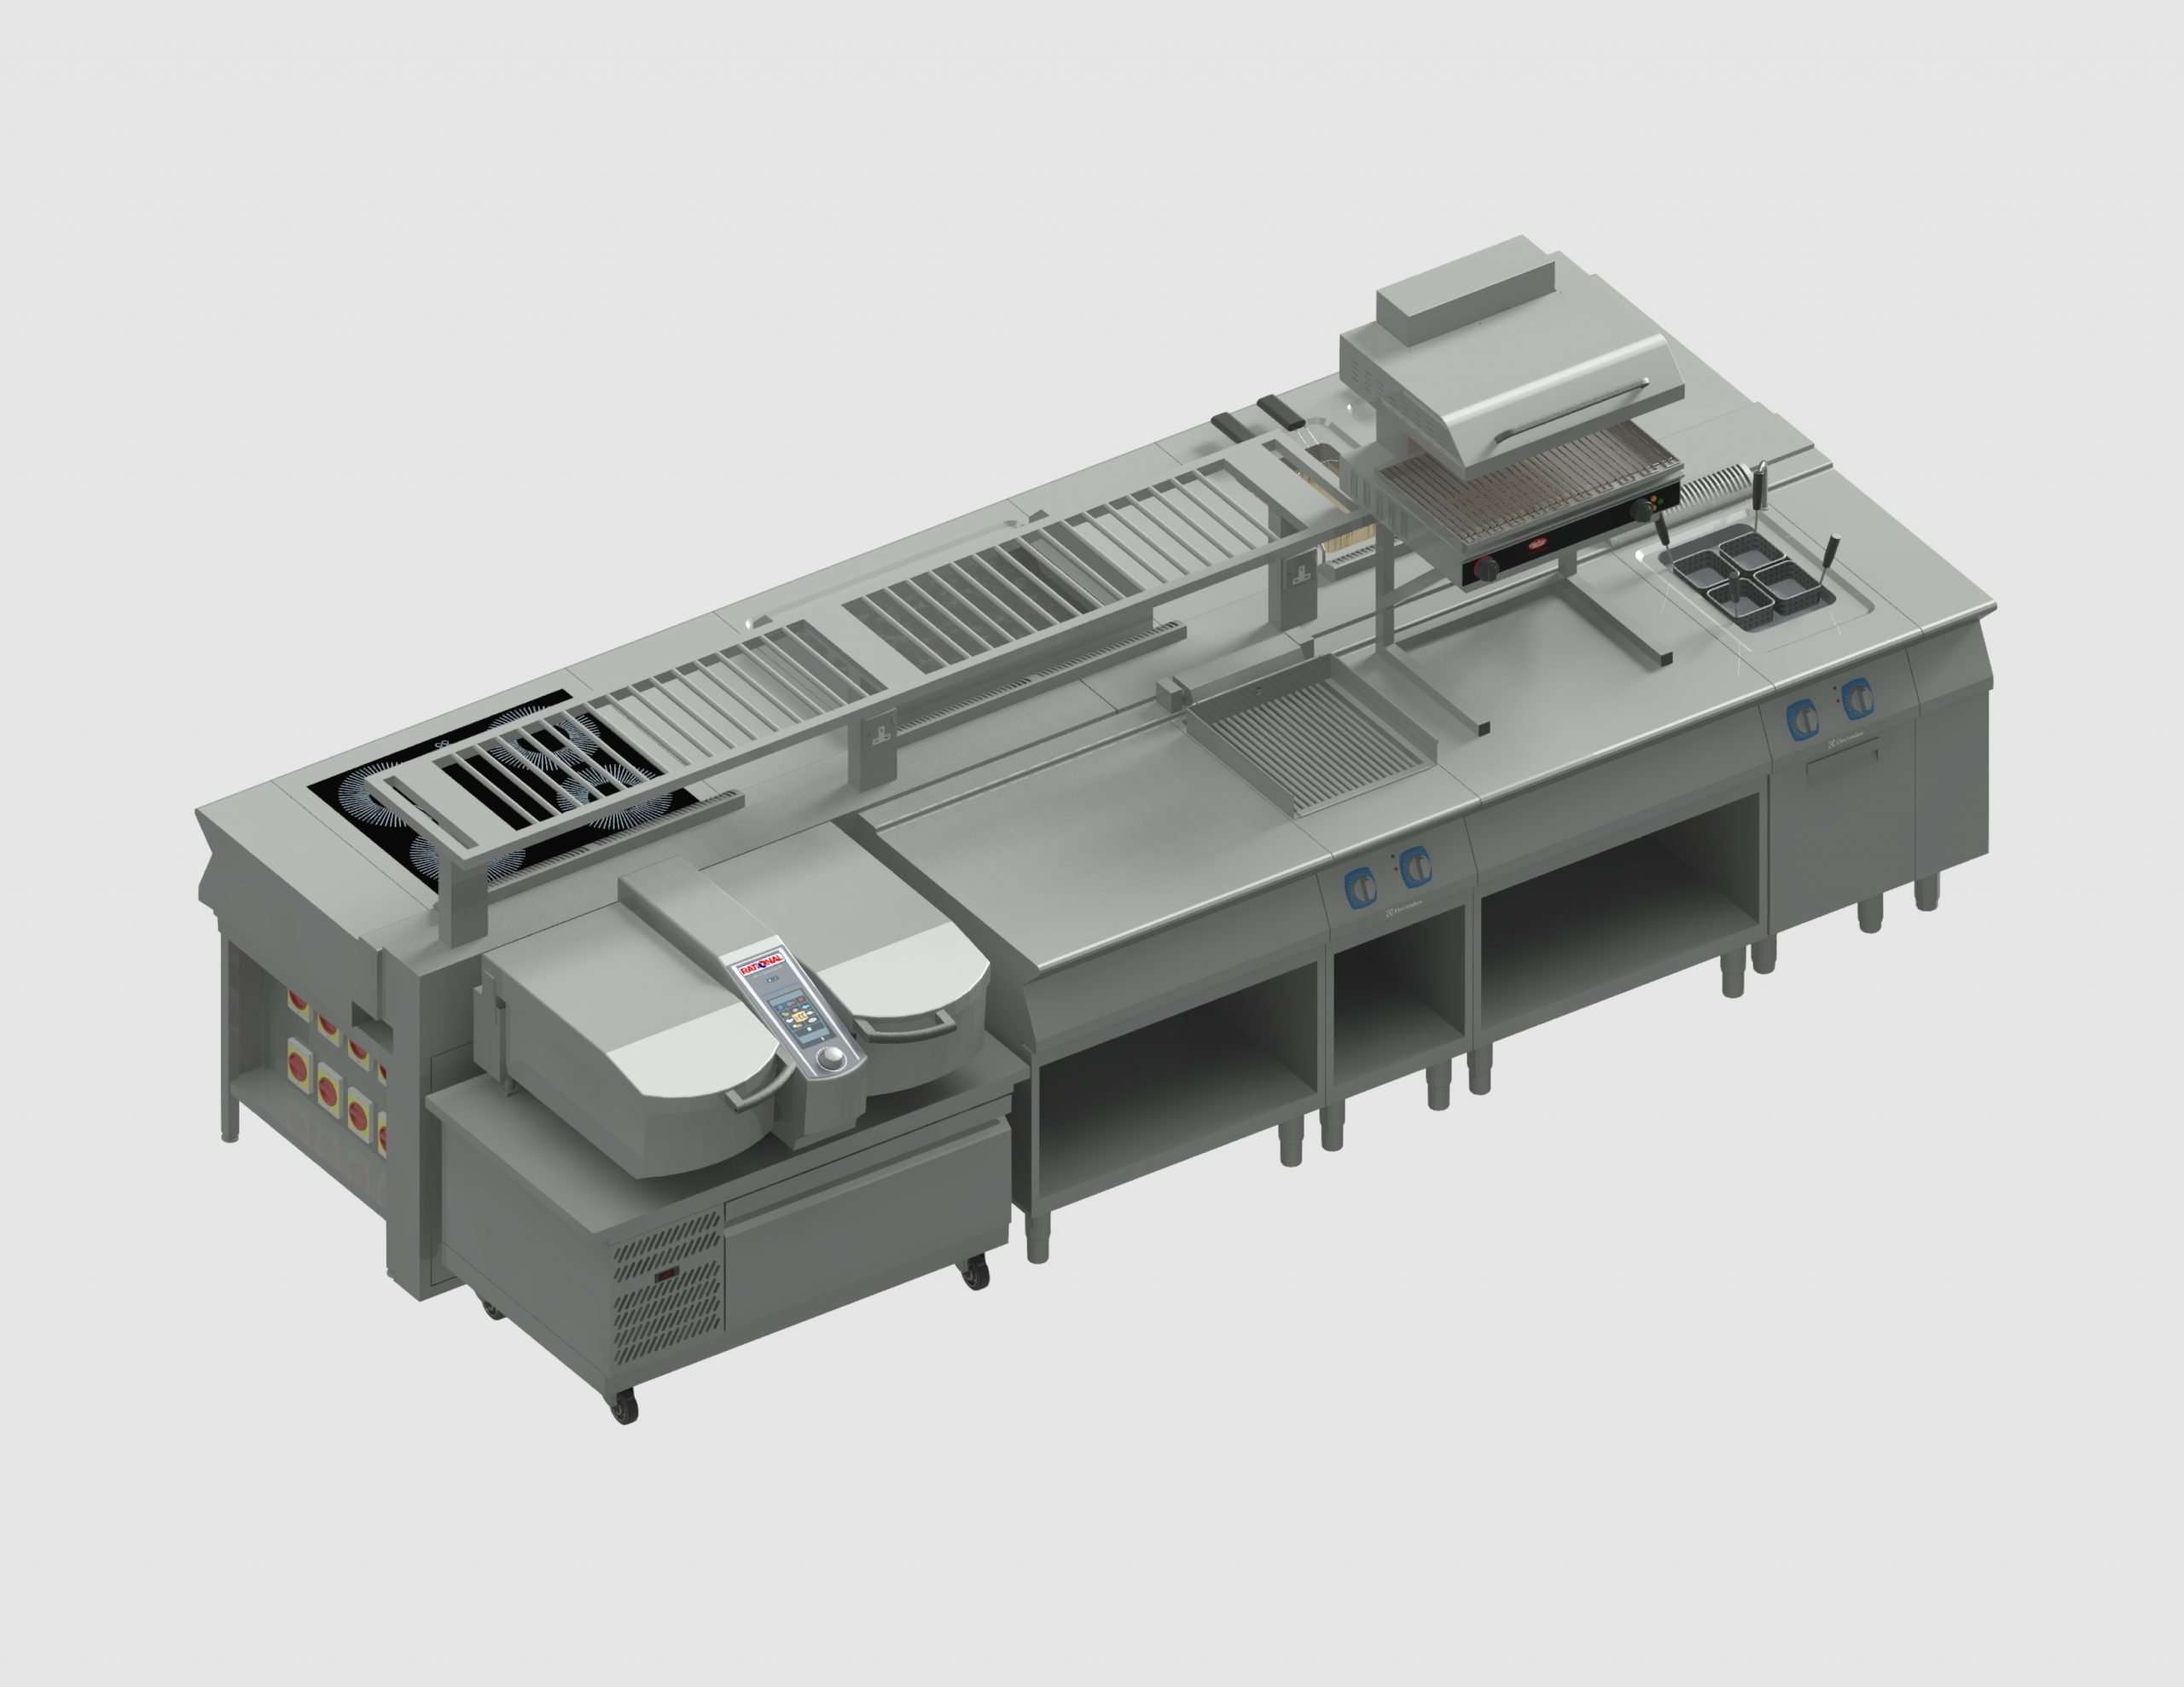 E1357 3Dmodel05 - The Ostrich - Cookline-Temp0005